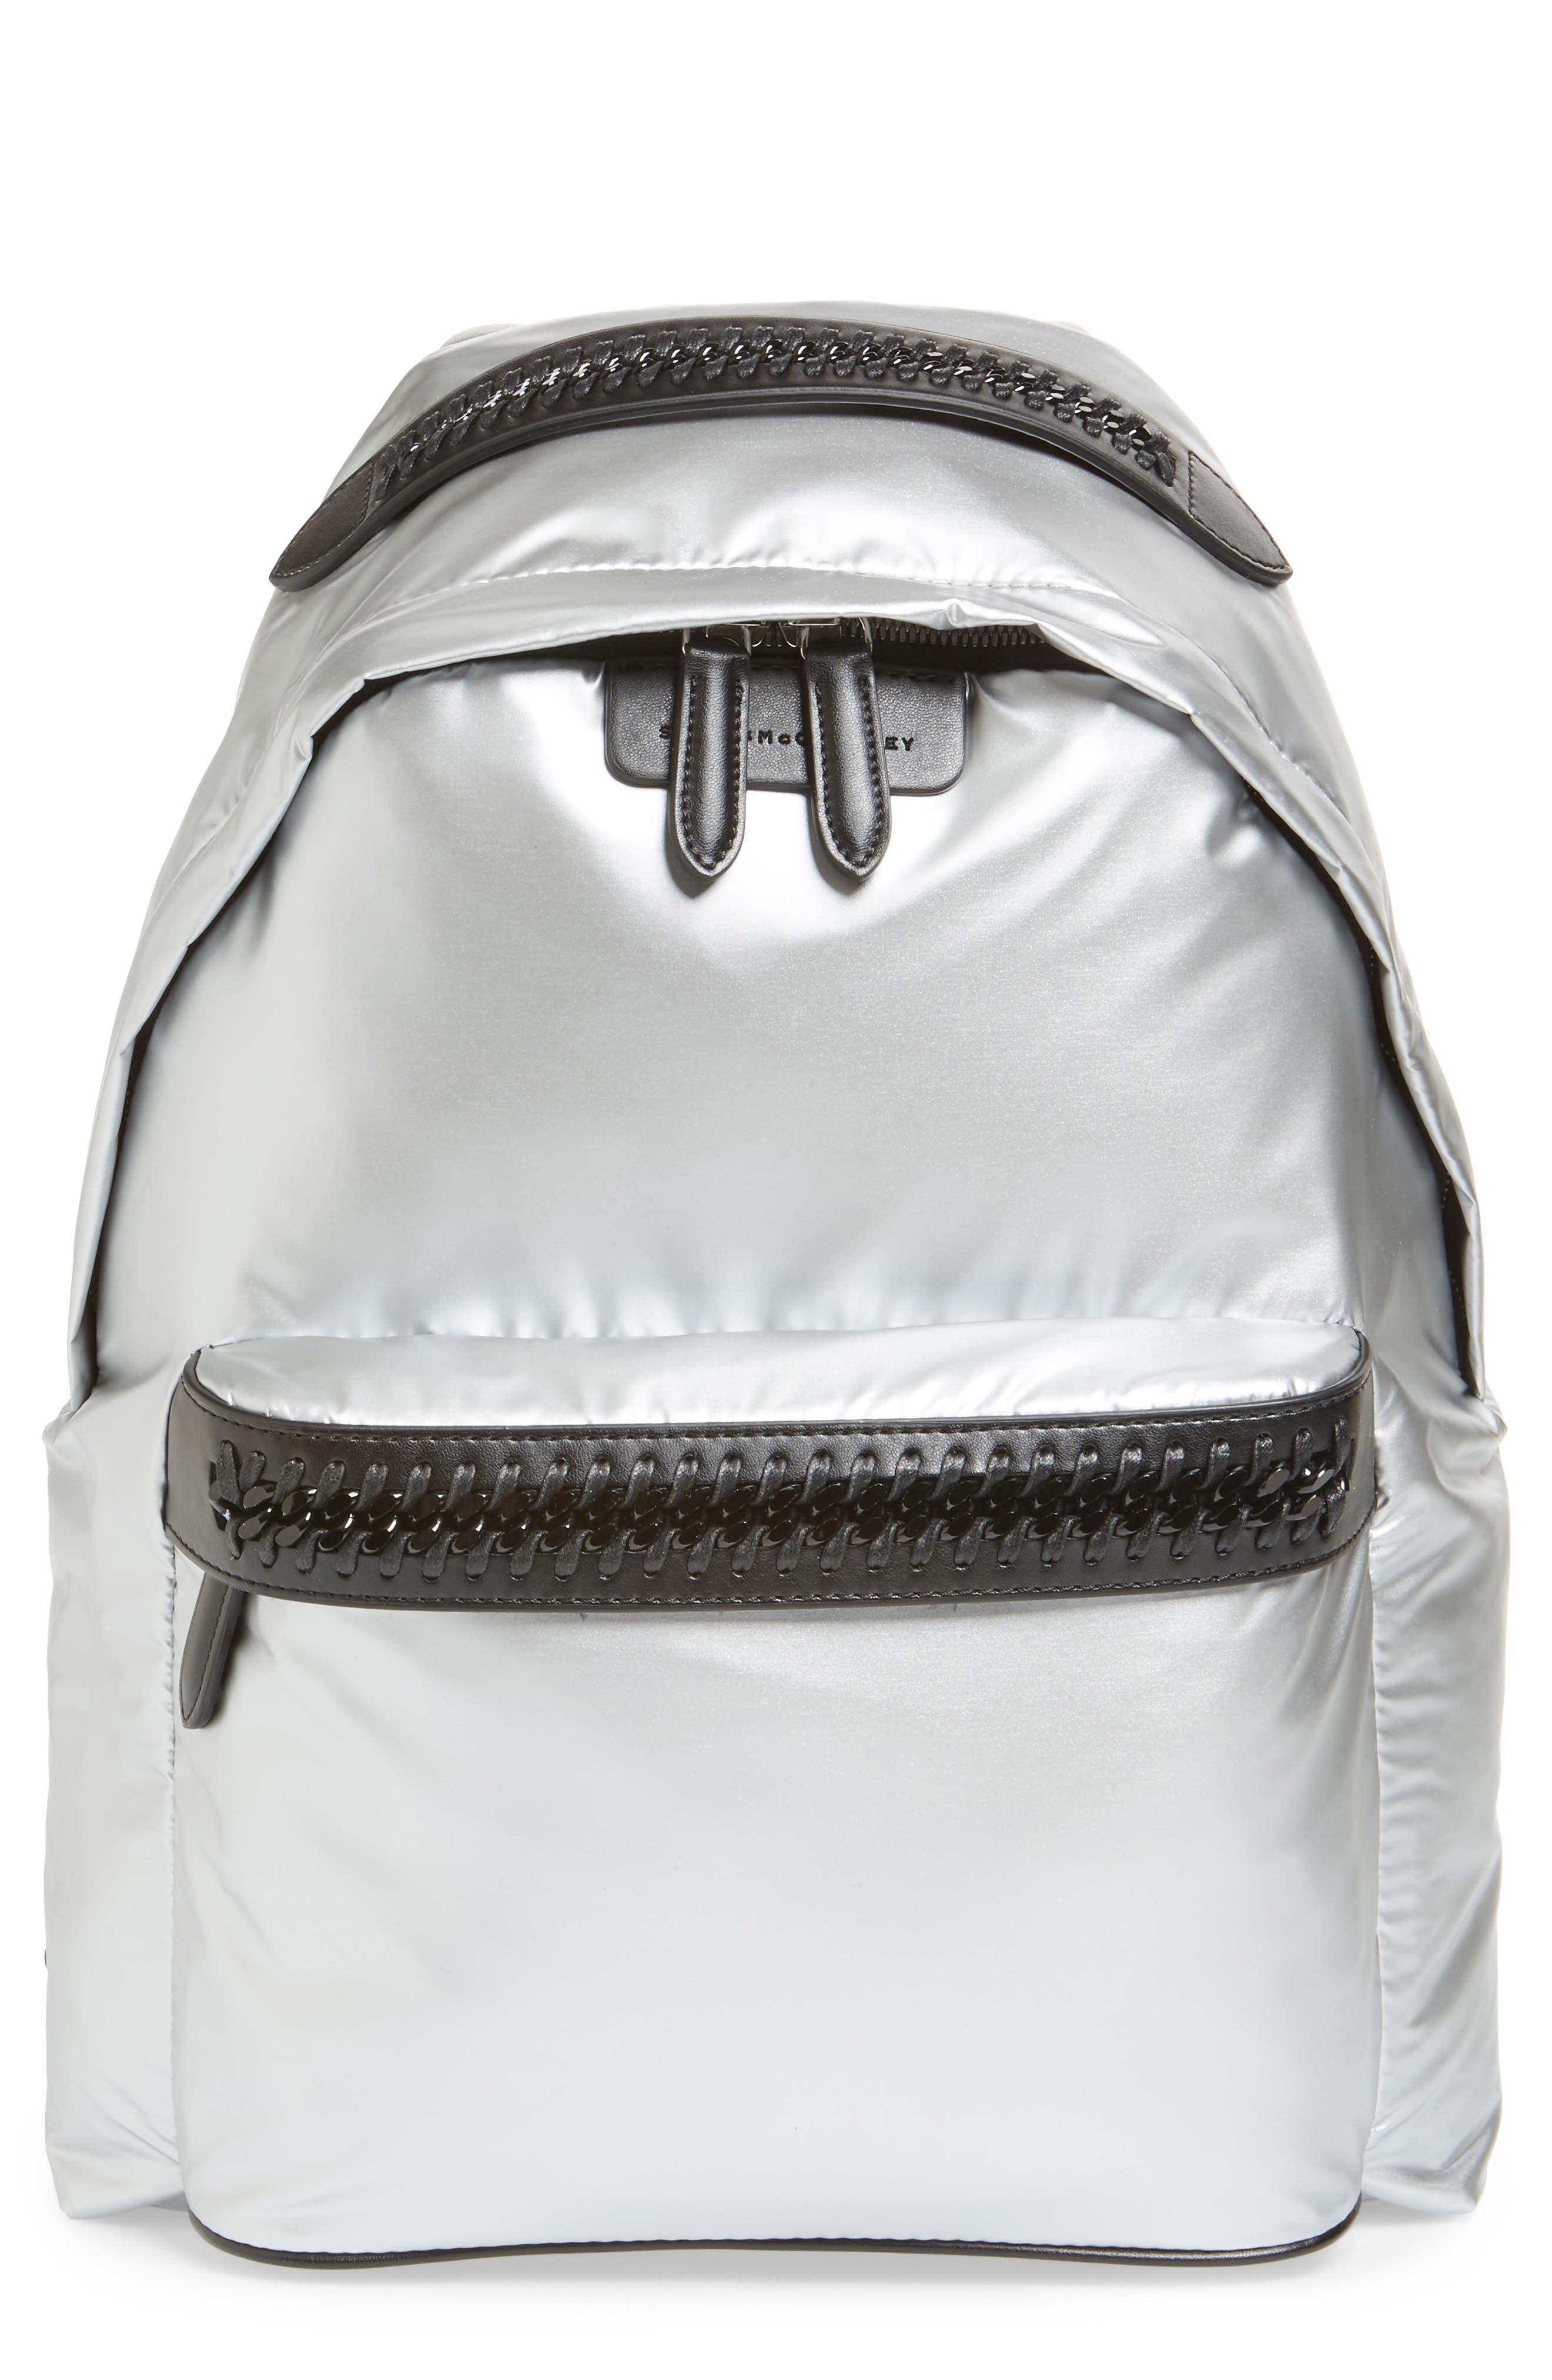 Falabella Metallic Nylon Backpack,                         Main,                         color, 045